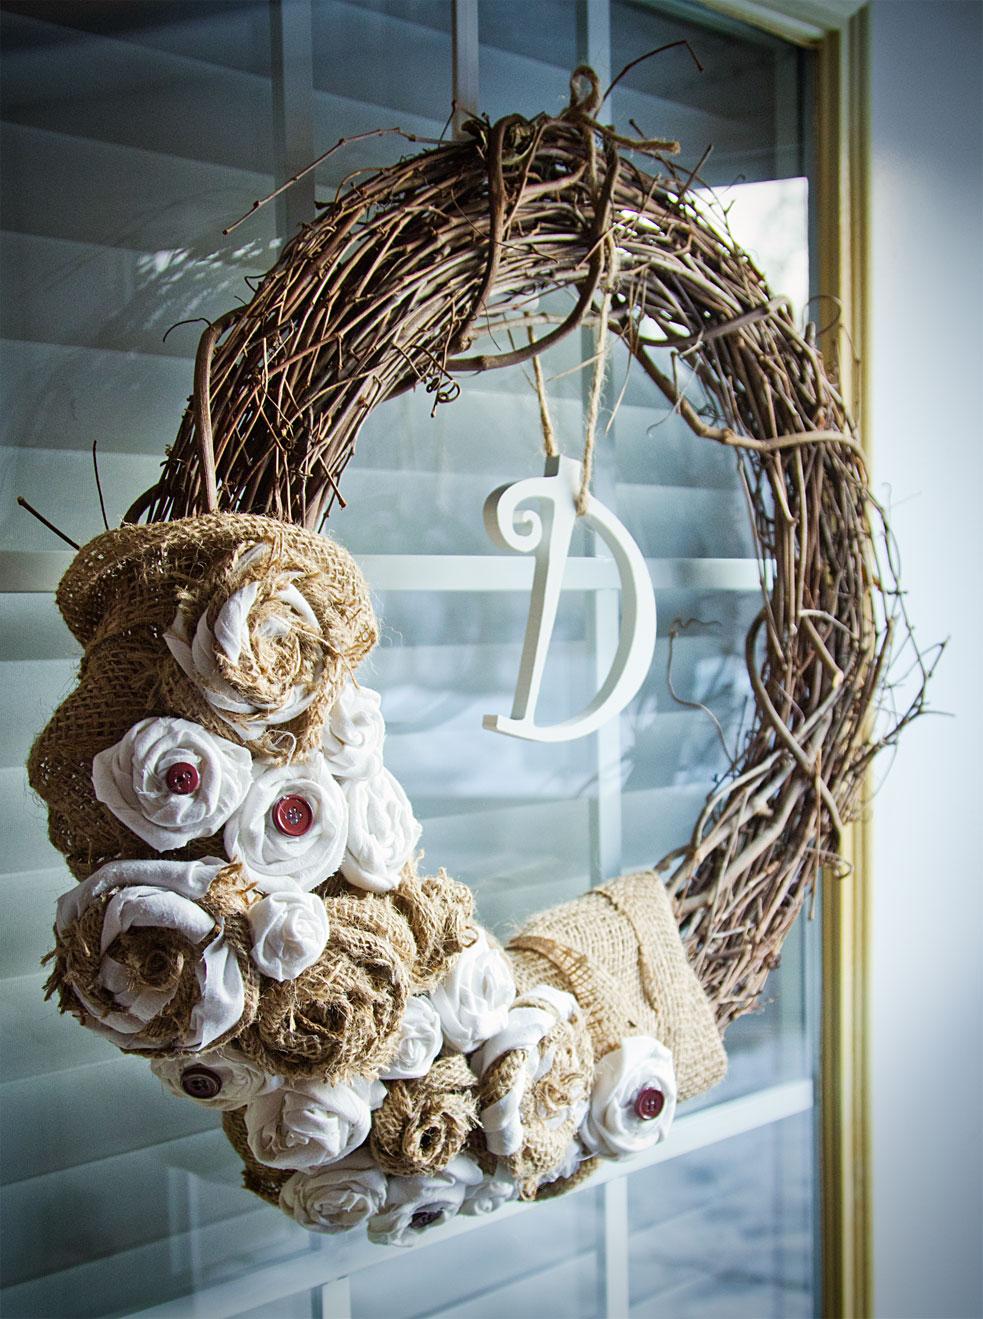 Diy burlap wedding wreath the day i say quot i do quot pinterest